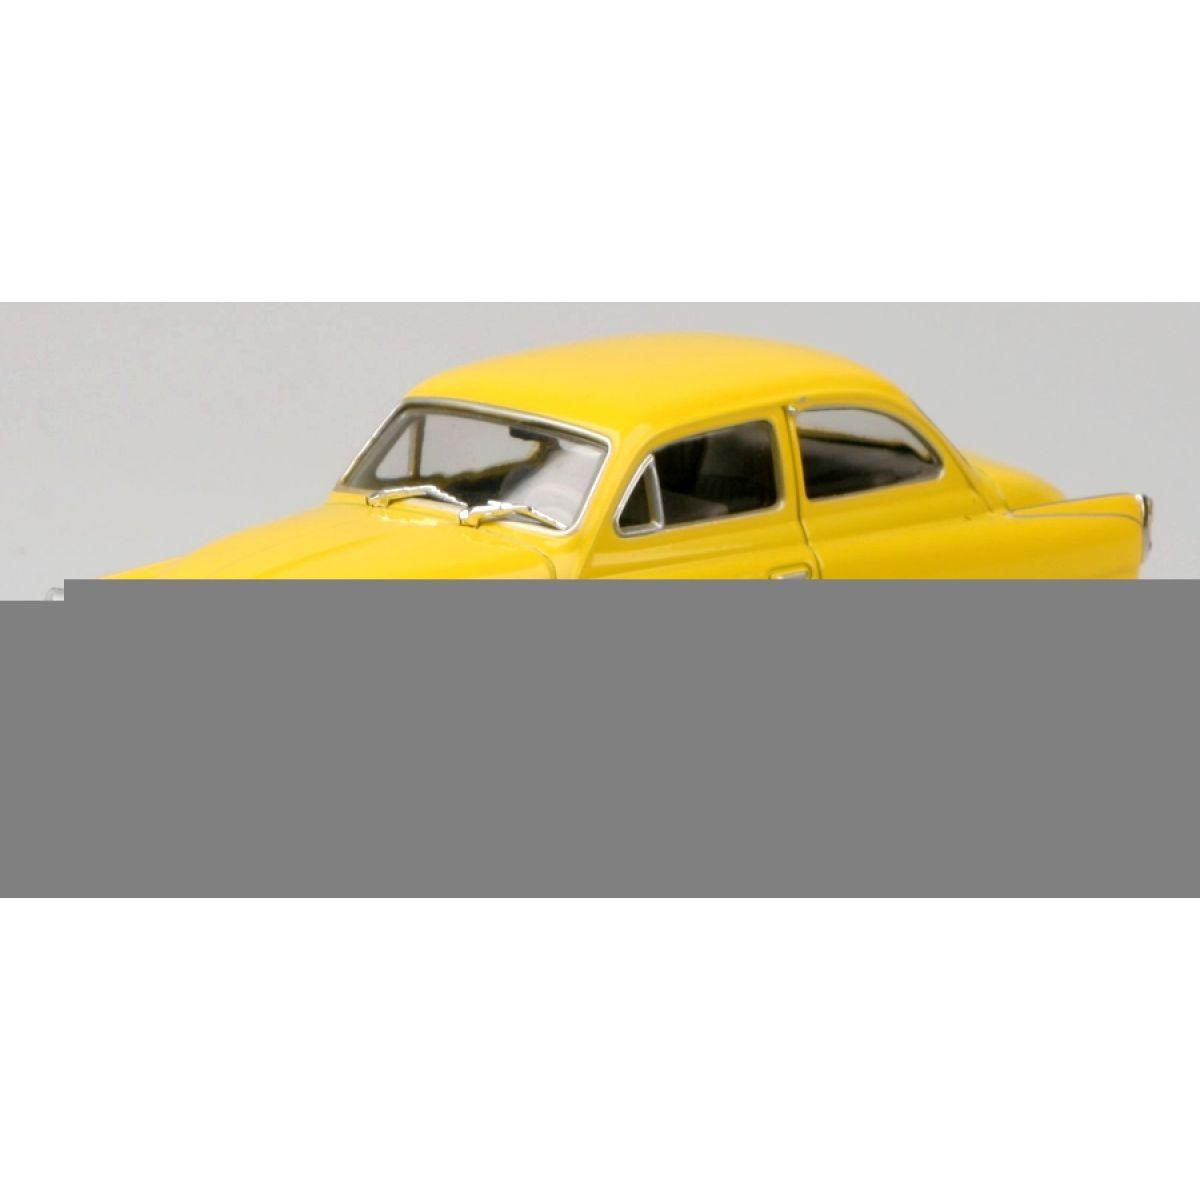 Škoda Octavia 1964 žlutá